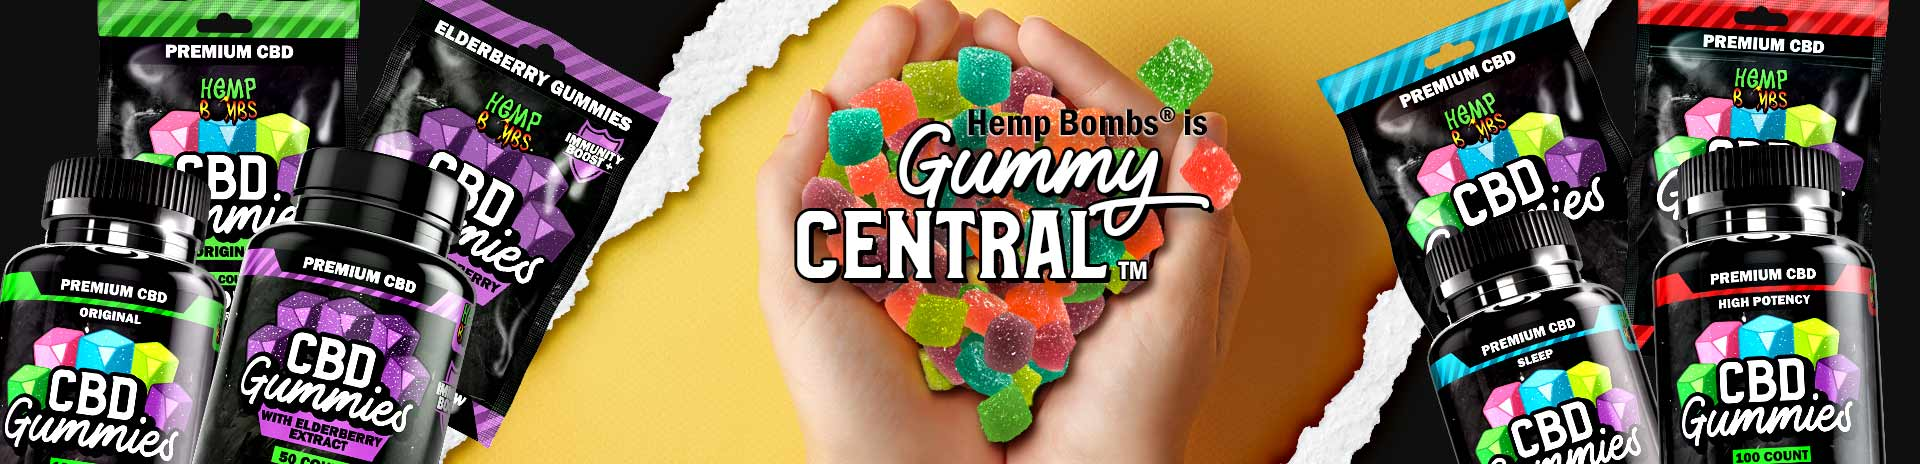 CBD Gummies - Hemp Bombs is Gummy Central